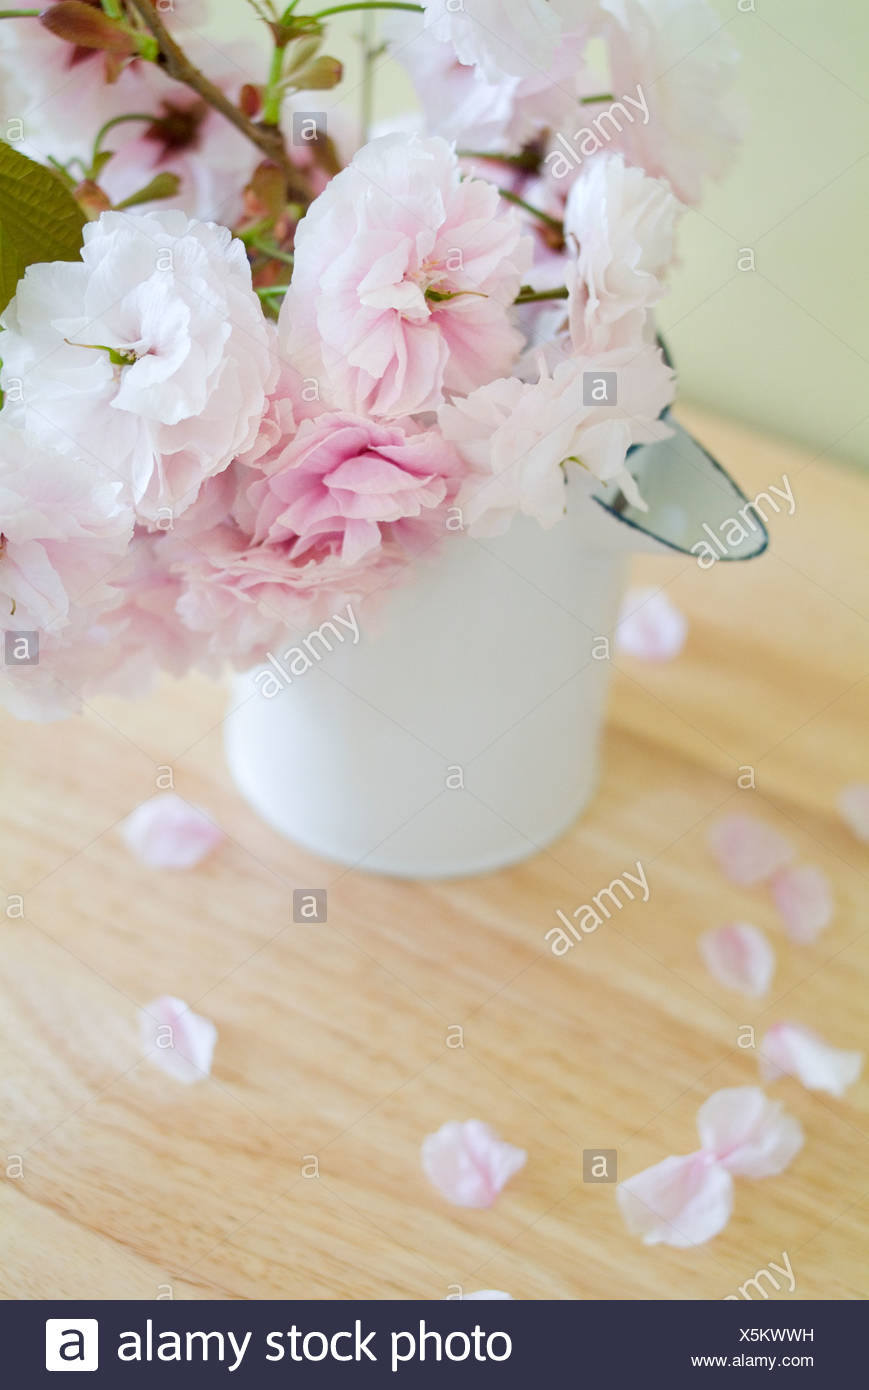 flower vase gravel with Japanese Cherry Tree on Diy Succulent Terrarium besides Sensational Shoe Planters besides Diy Ideas How To Make Fairy Garden moreover Flowery Fields moreover Delightful Pea Gravel Patio Decorating Ideas.